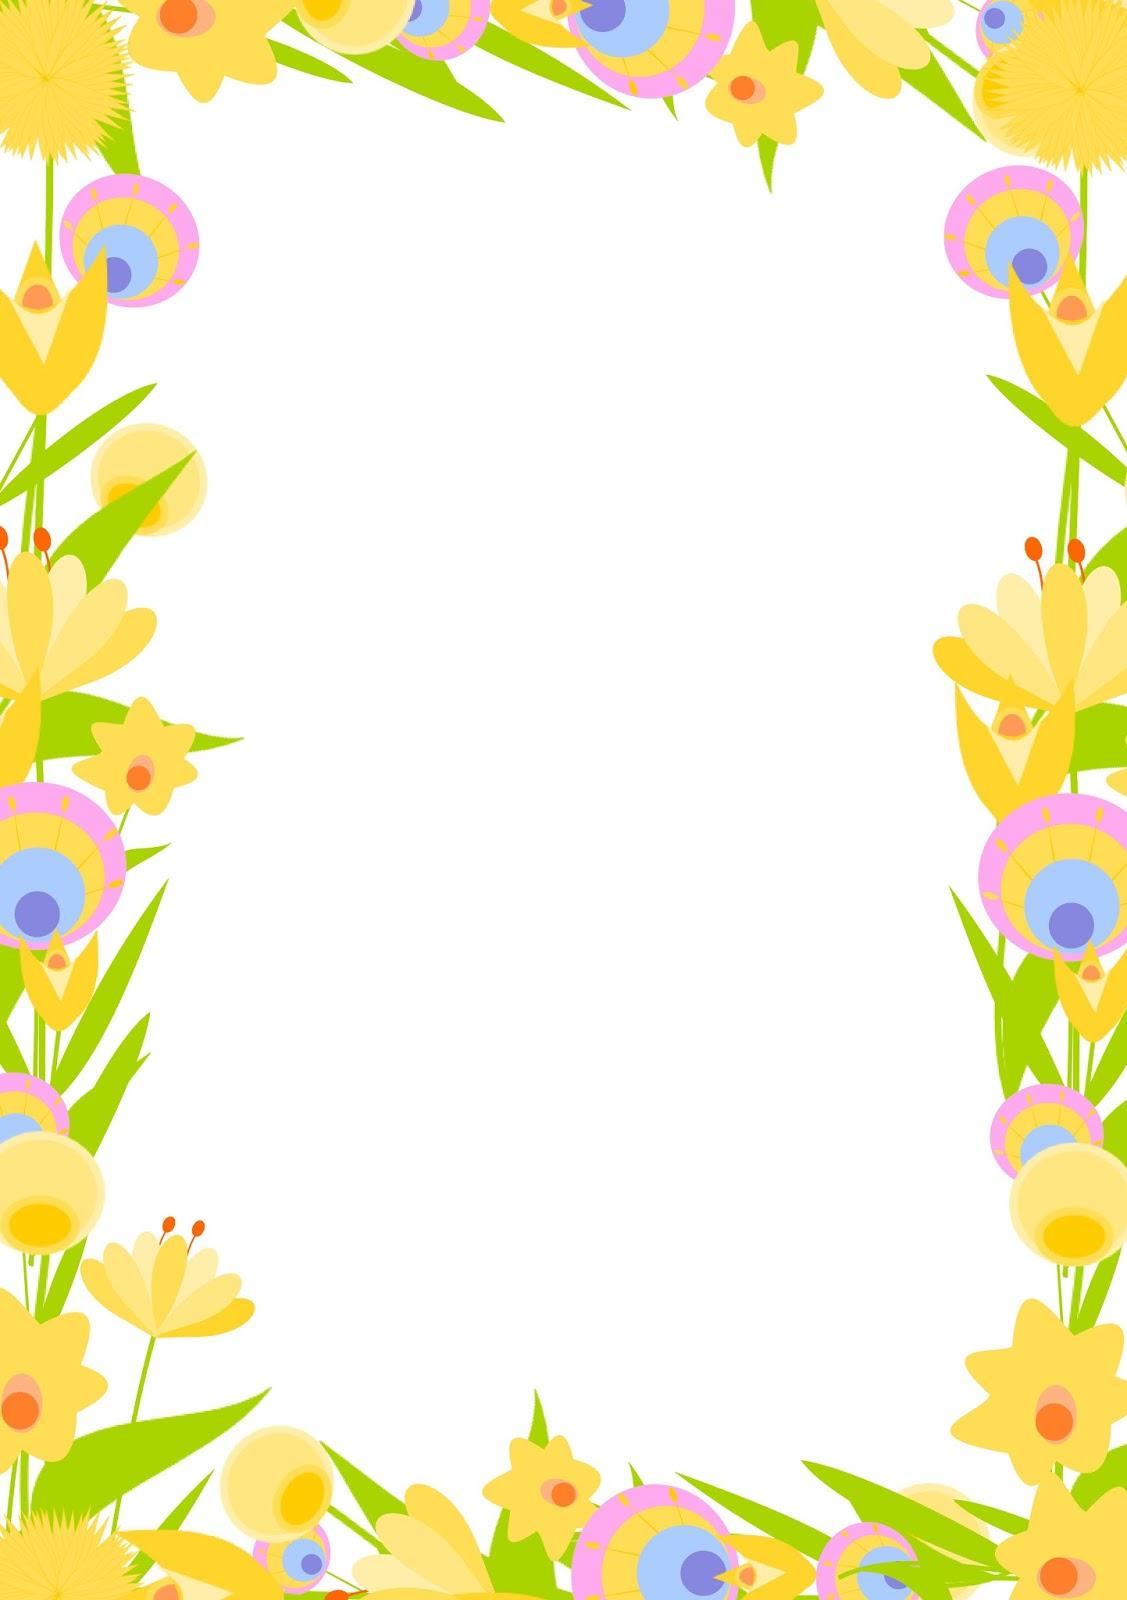 Free digital floral frame png and DIY stationery ...